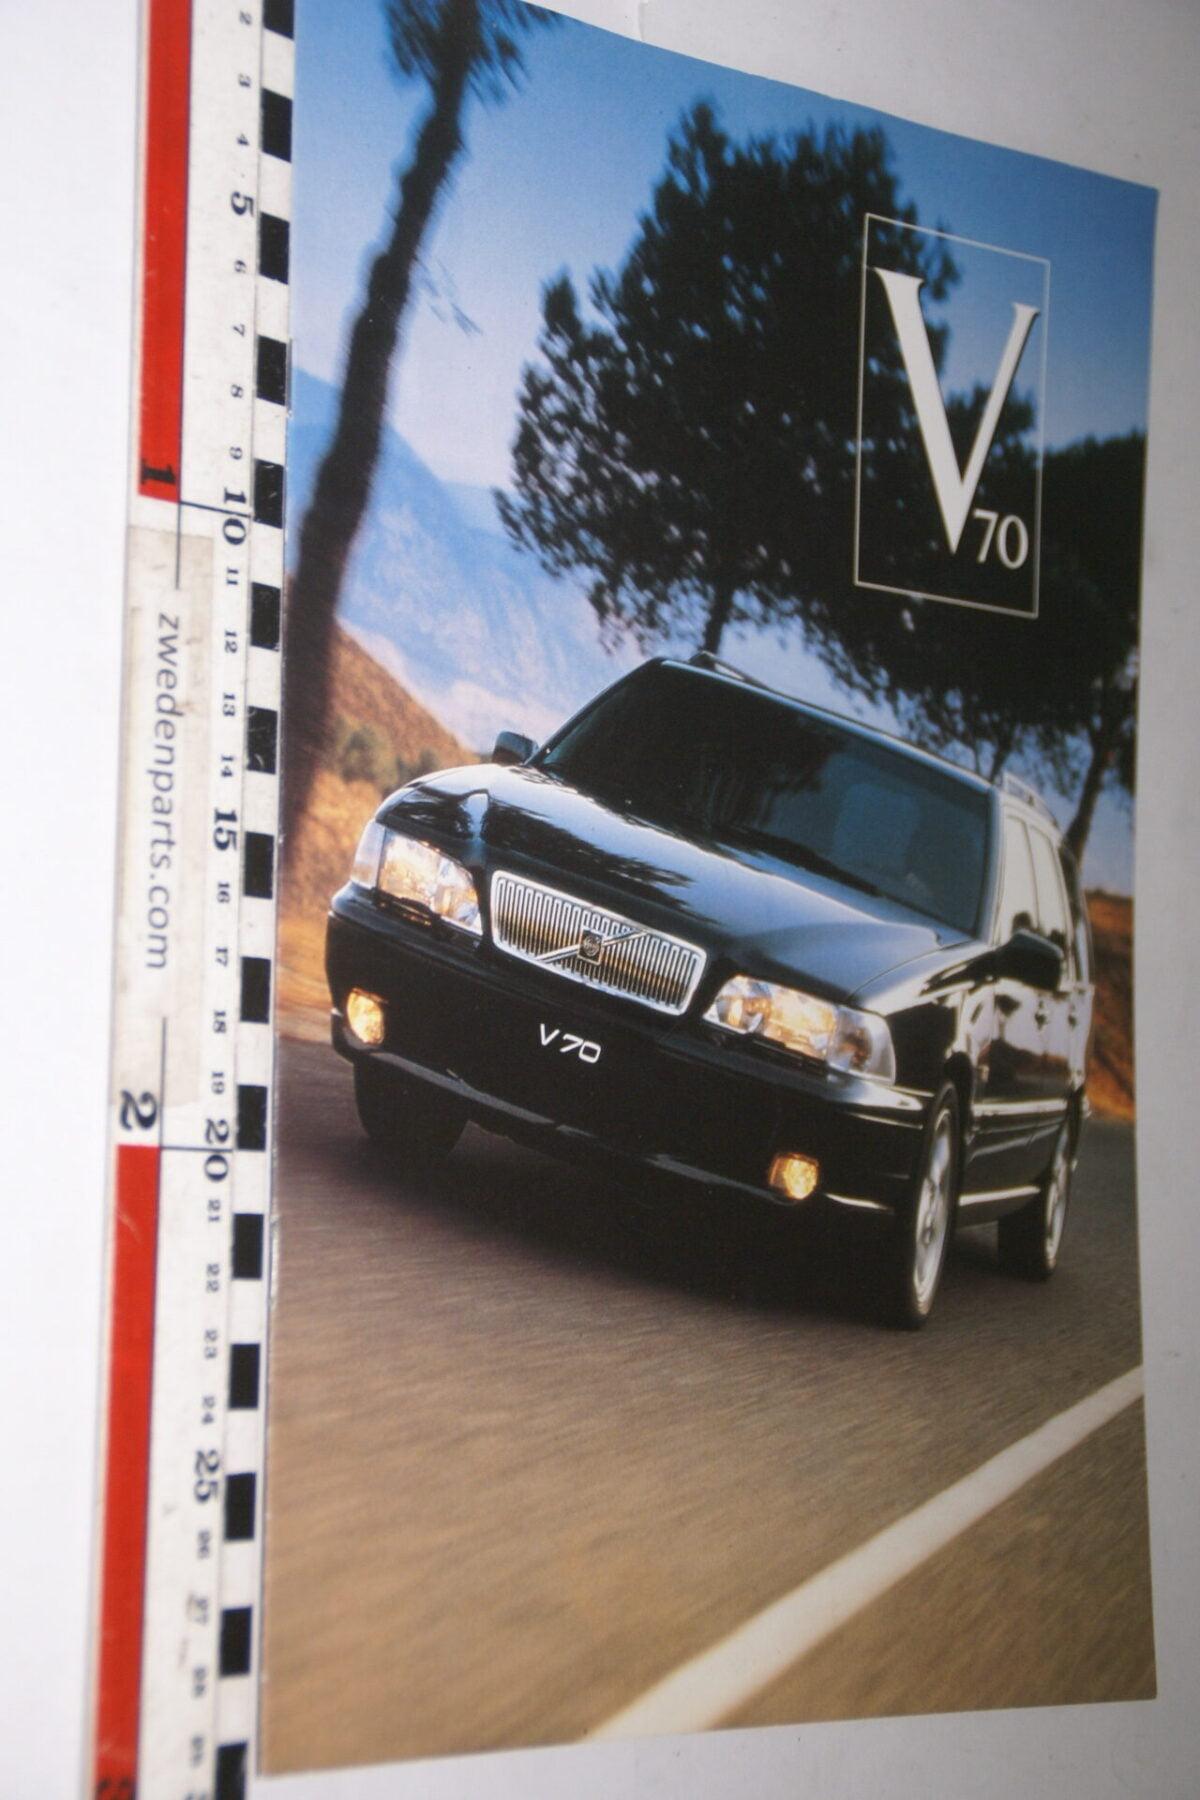 DSC05247 1996 originele brochure Volvo V70-290de9cd